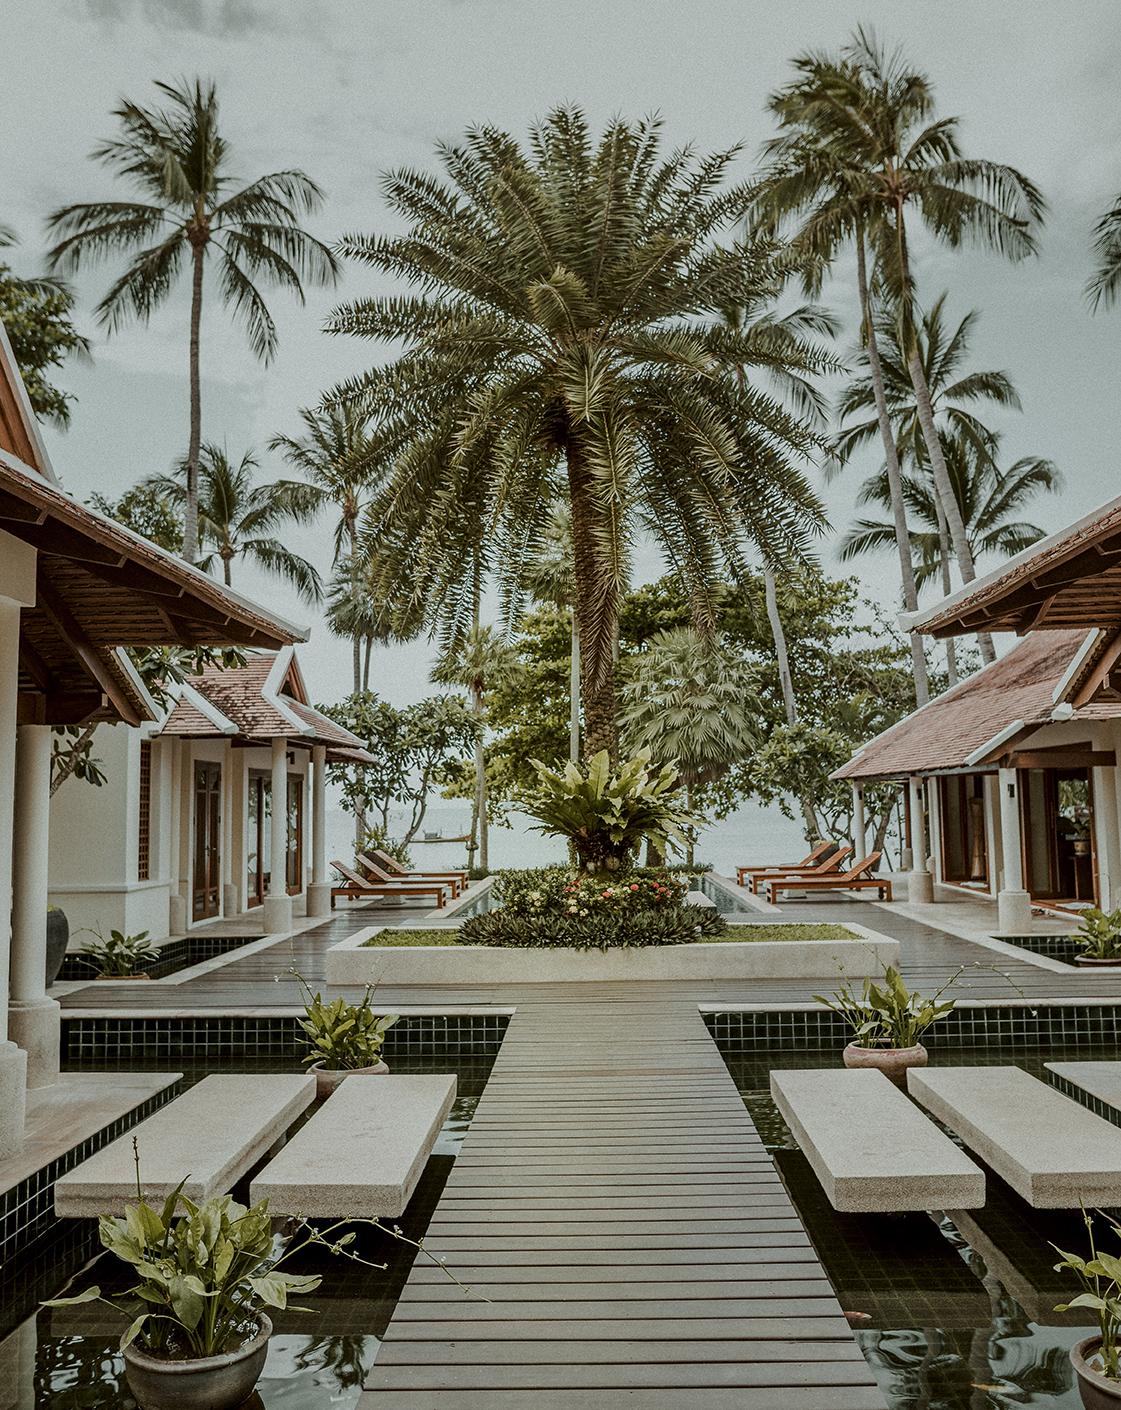 a tropical backyard with a pool